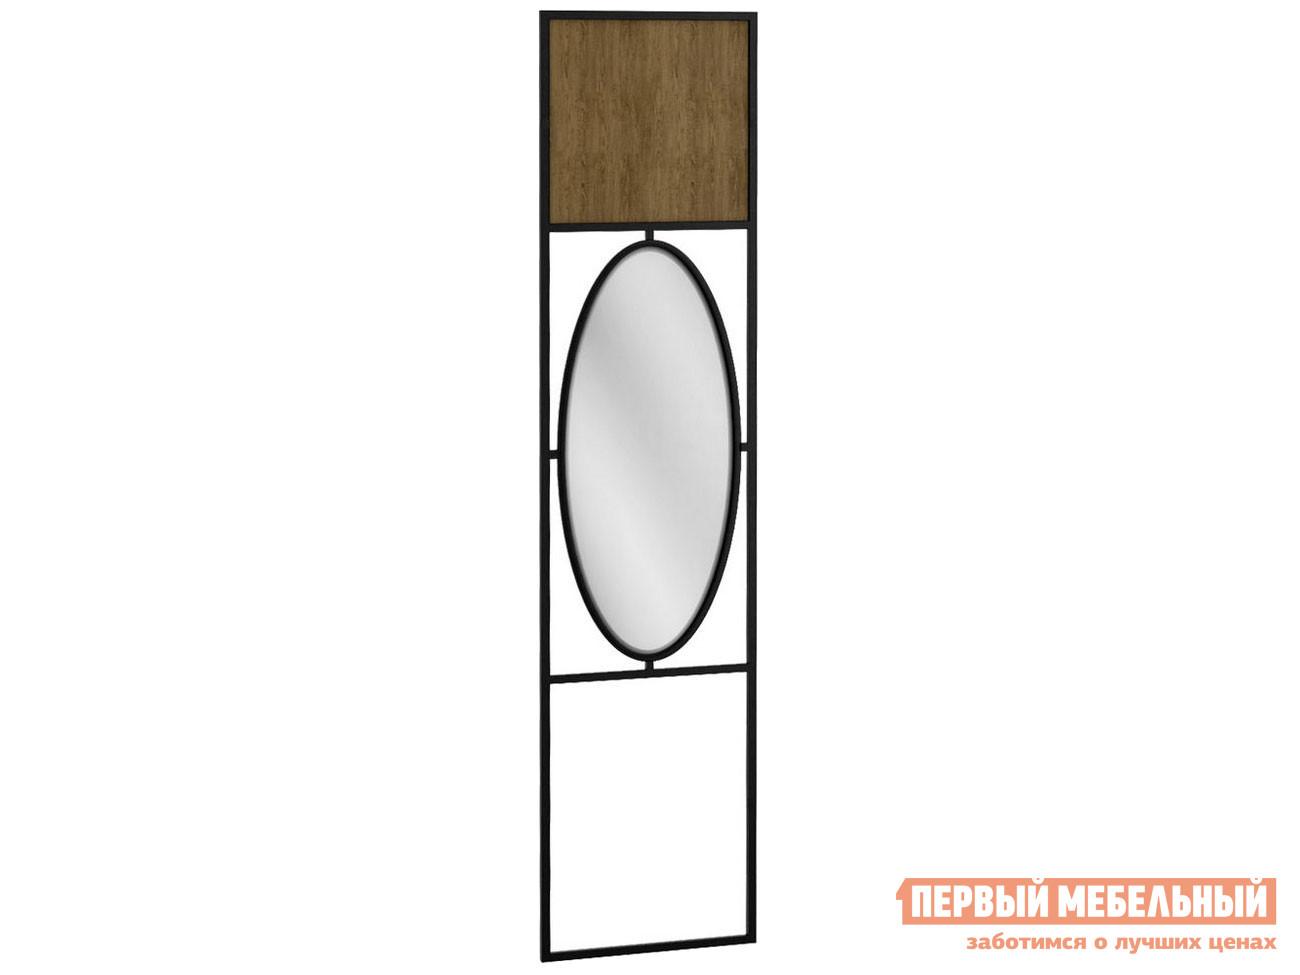 Настенное зеркало R-Home Панель для прихожей с зеркалом Loft 4009302h зеркало настенное home philosophy male collection 70379